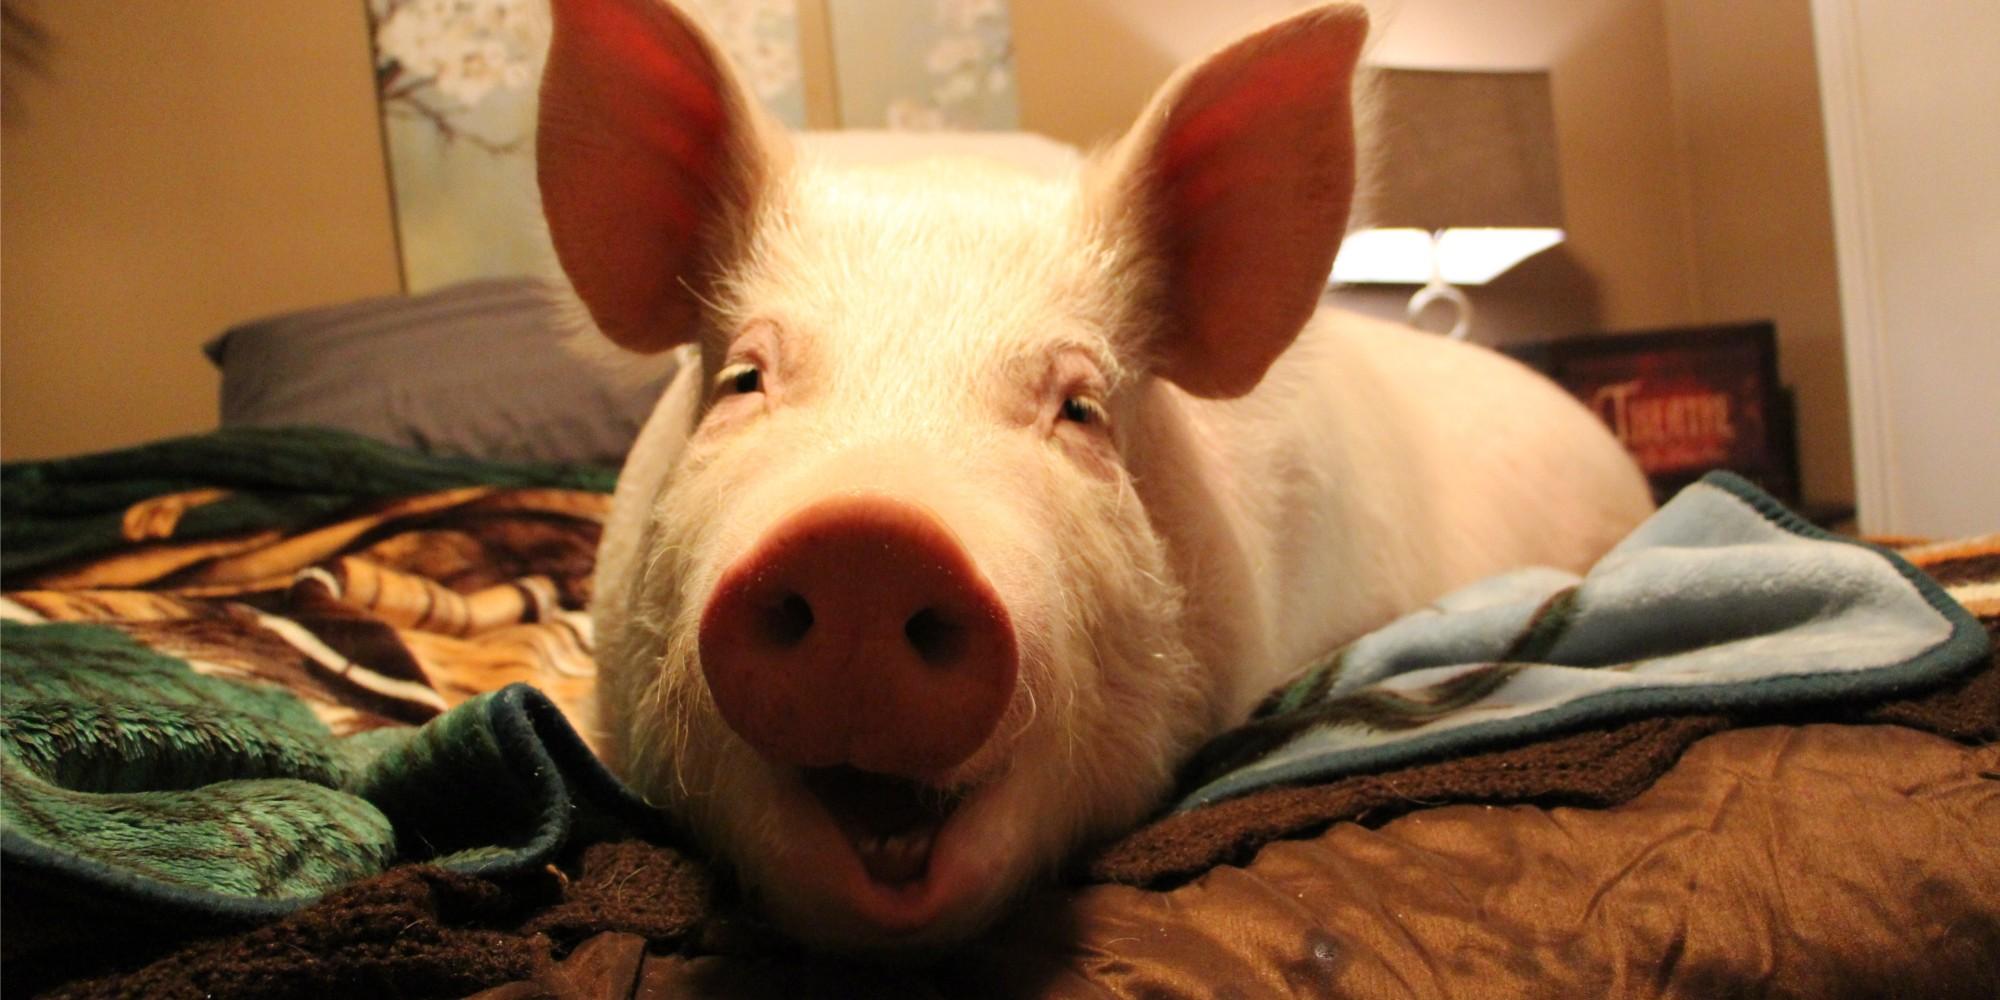 Risultati immagini per esther the wonder pig